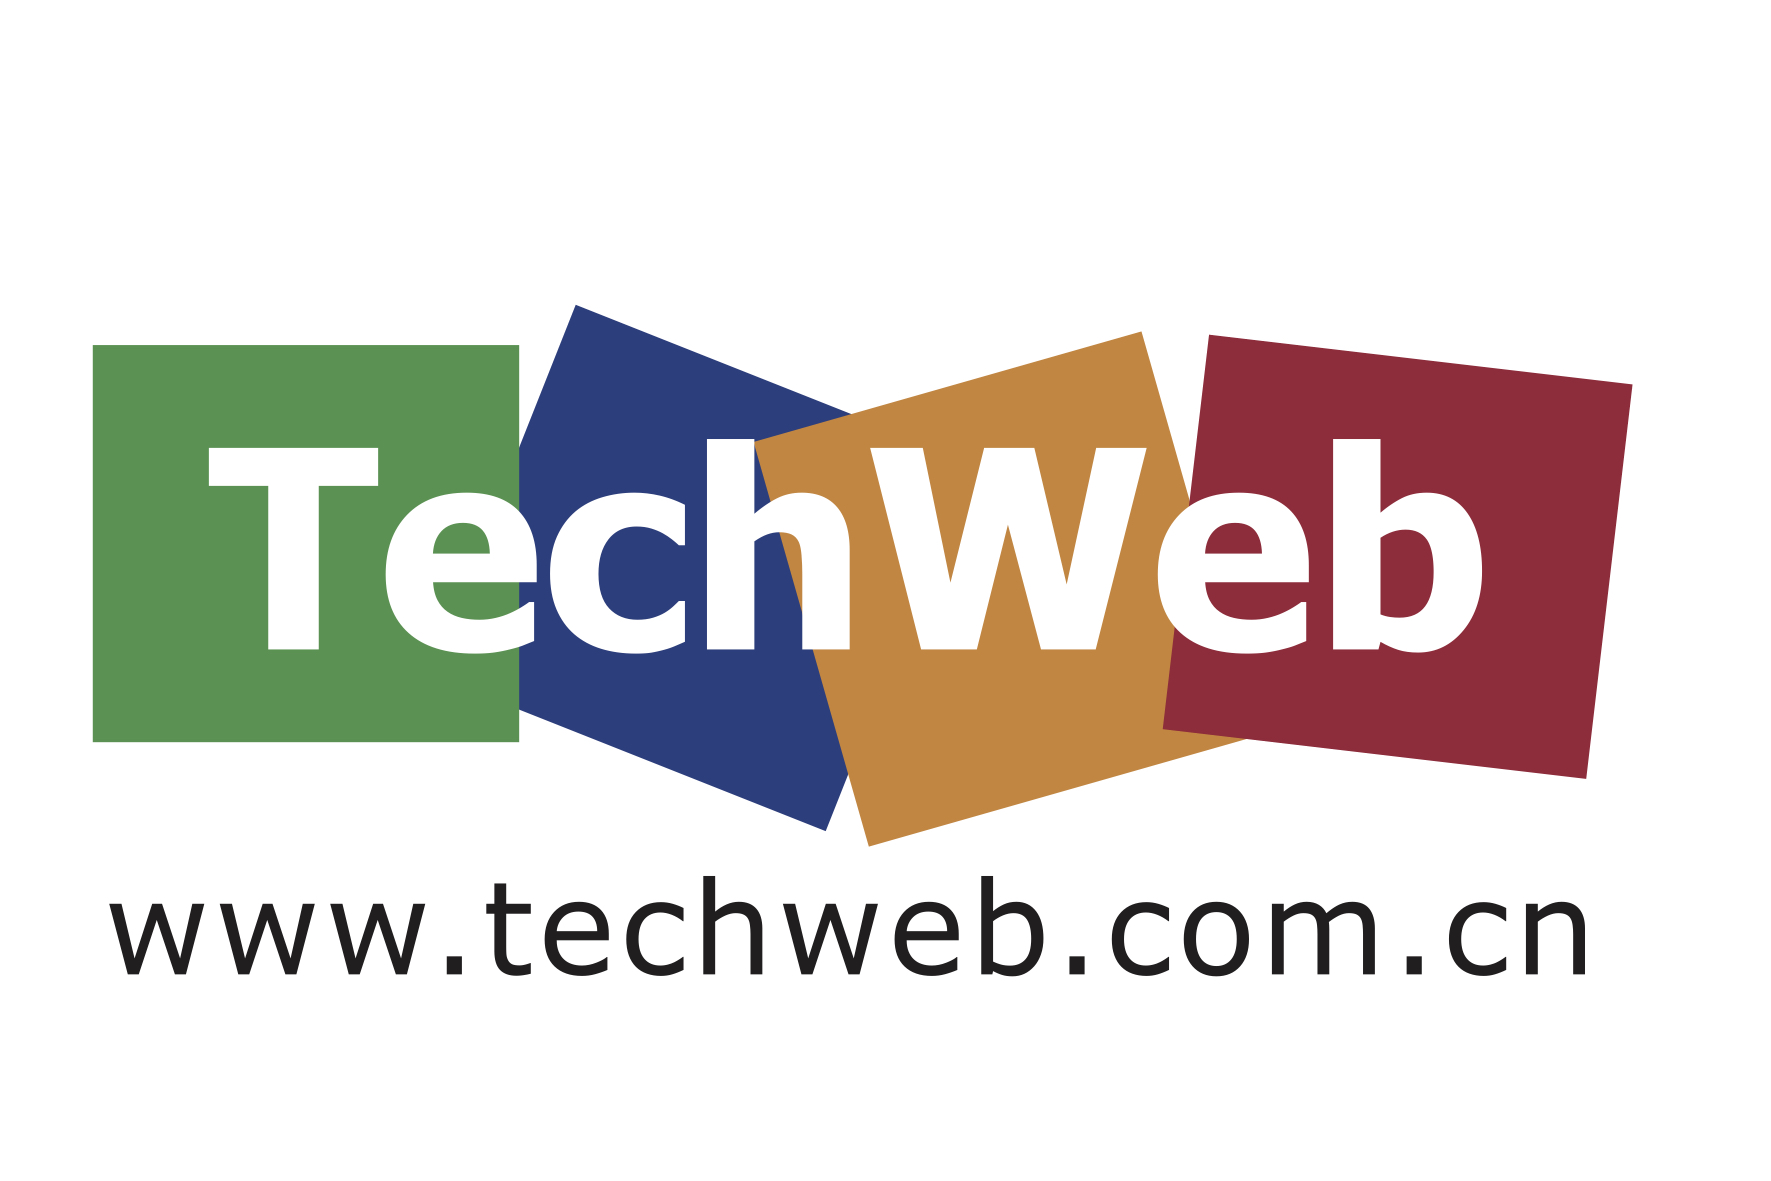 TechWeb-logo.jpg